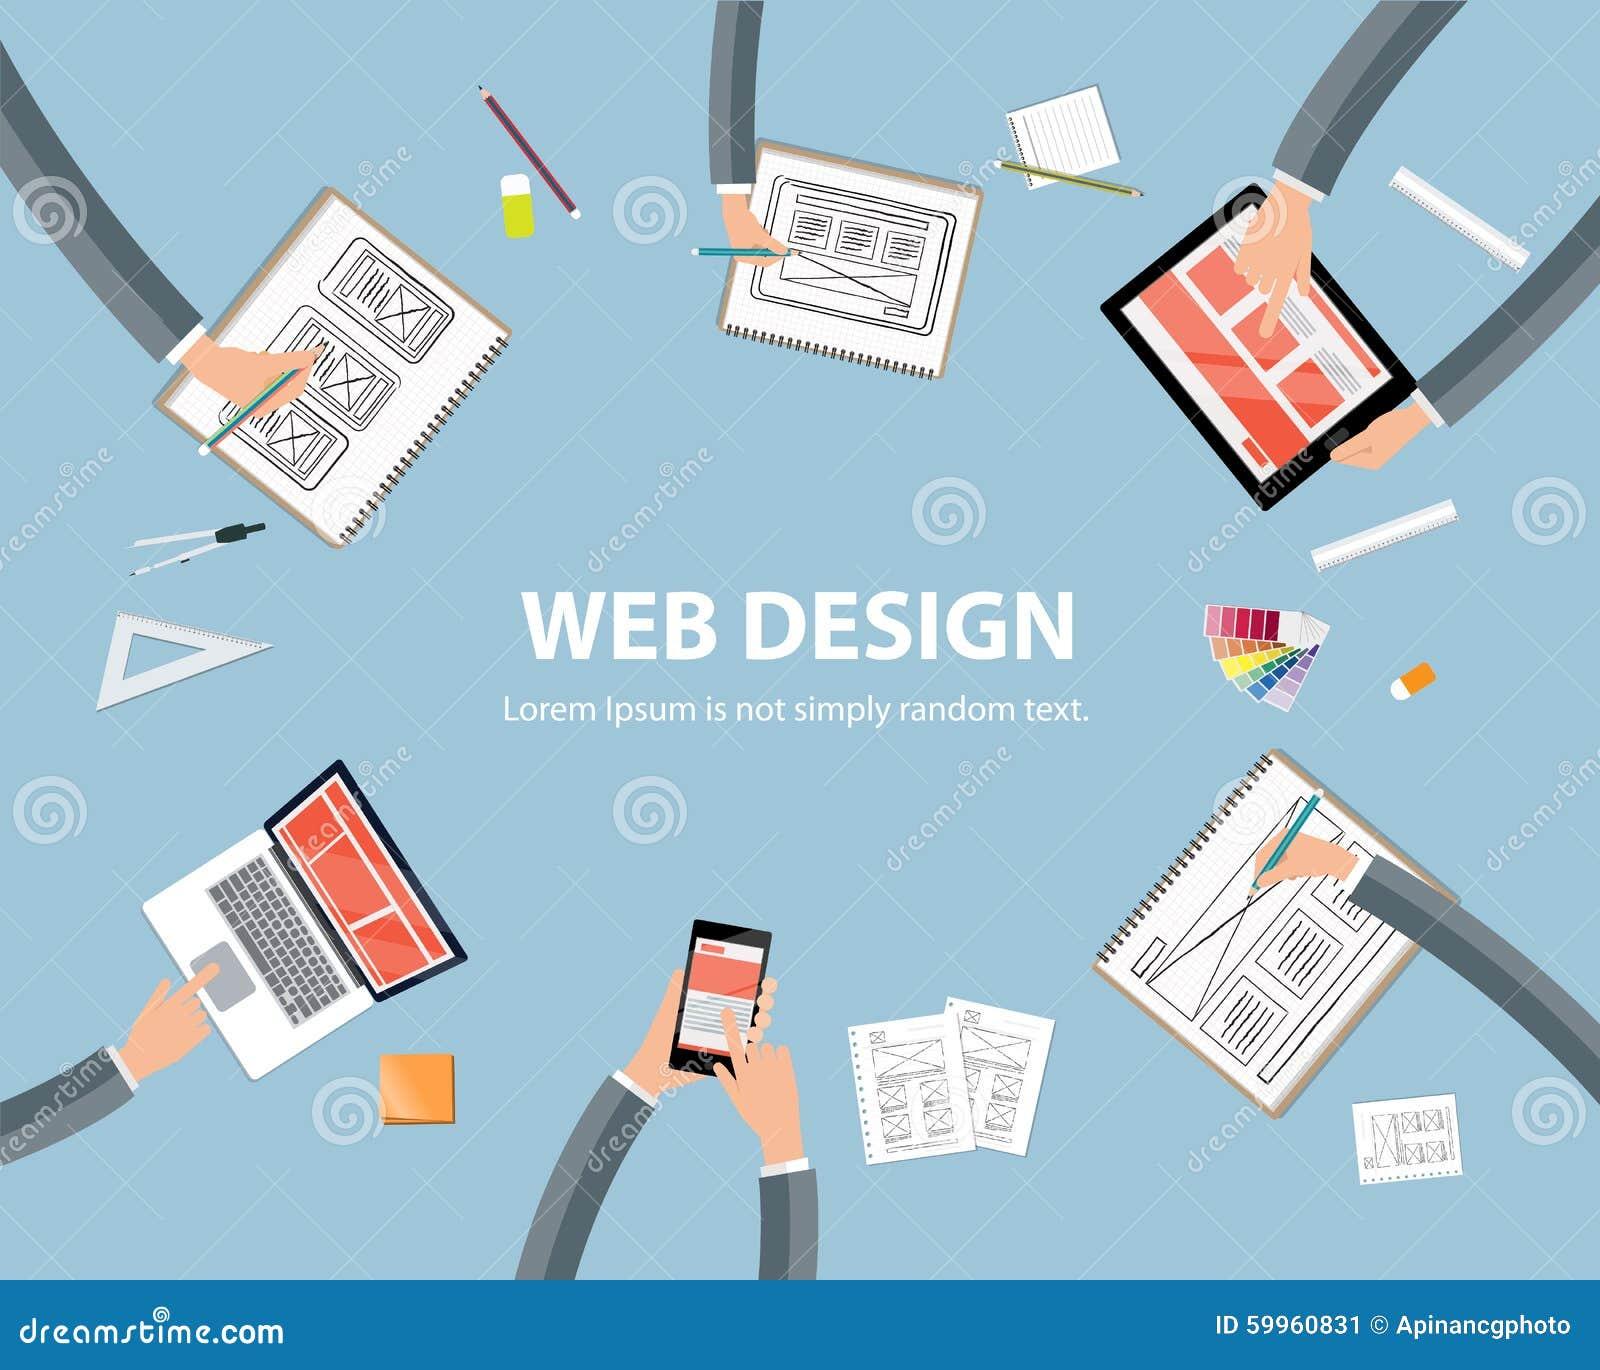 Web Design Workspace Concept Stock Vector Image 59960831